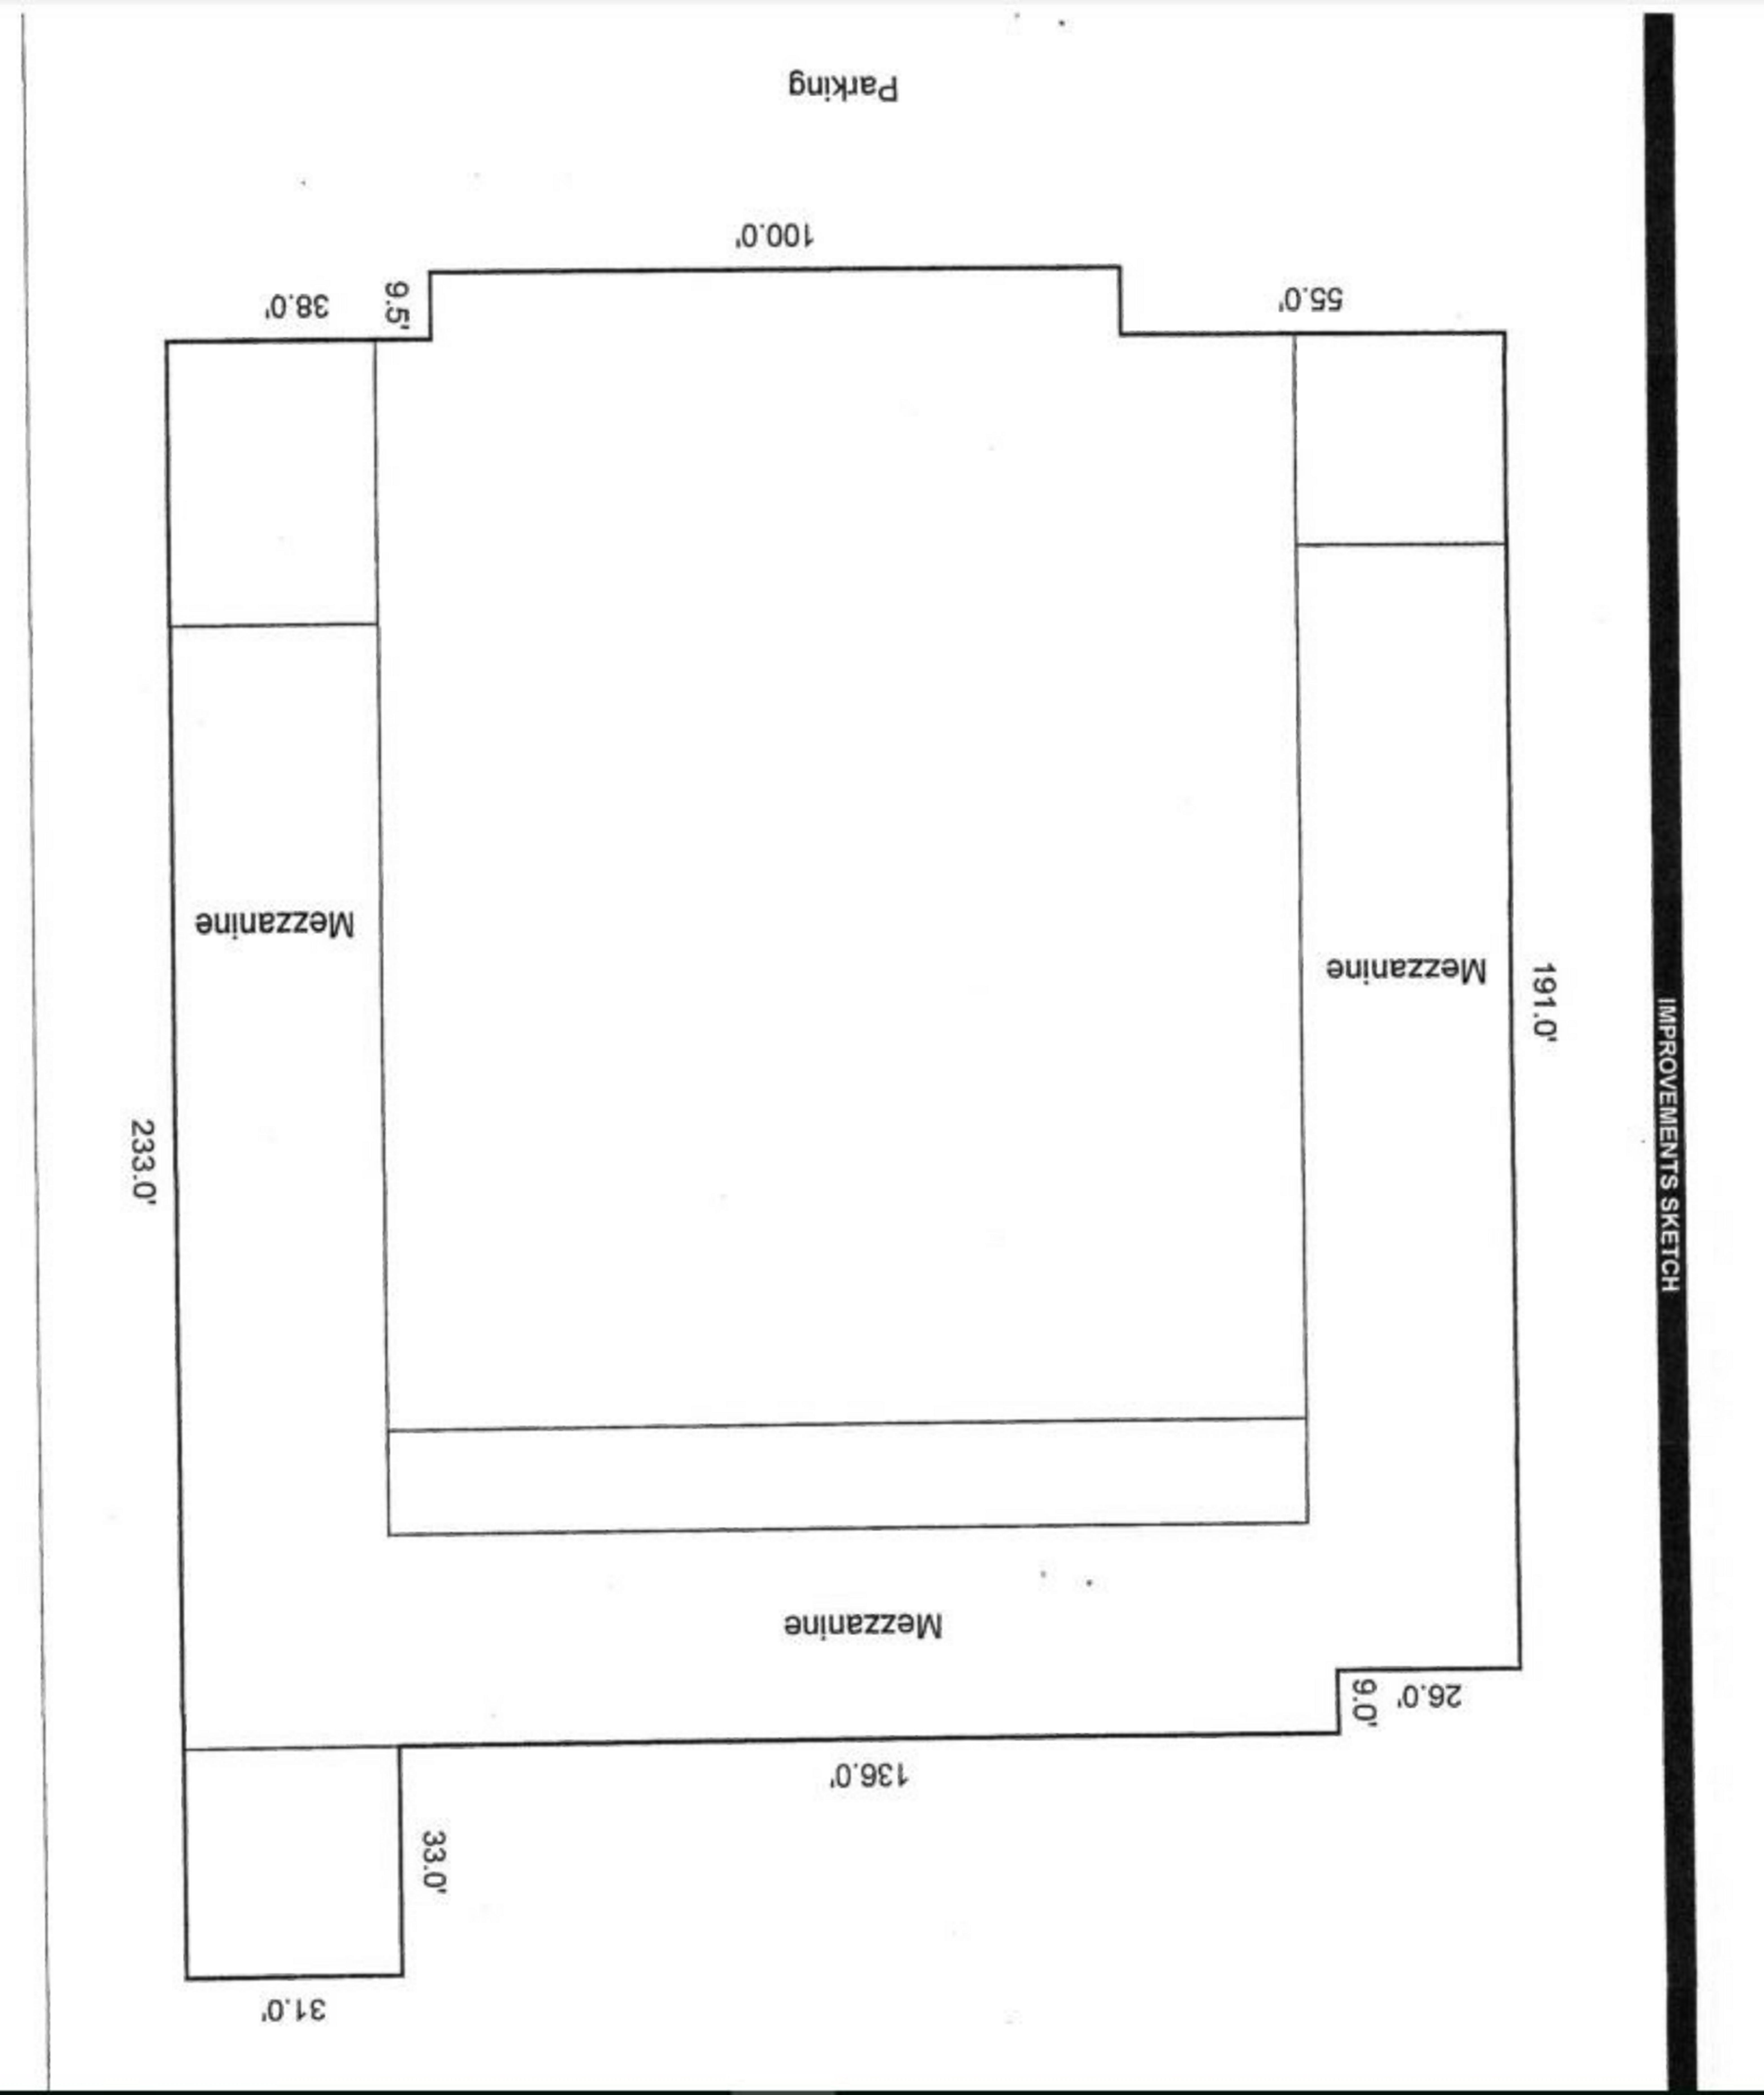 11340 South Street: site plan